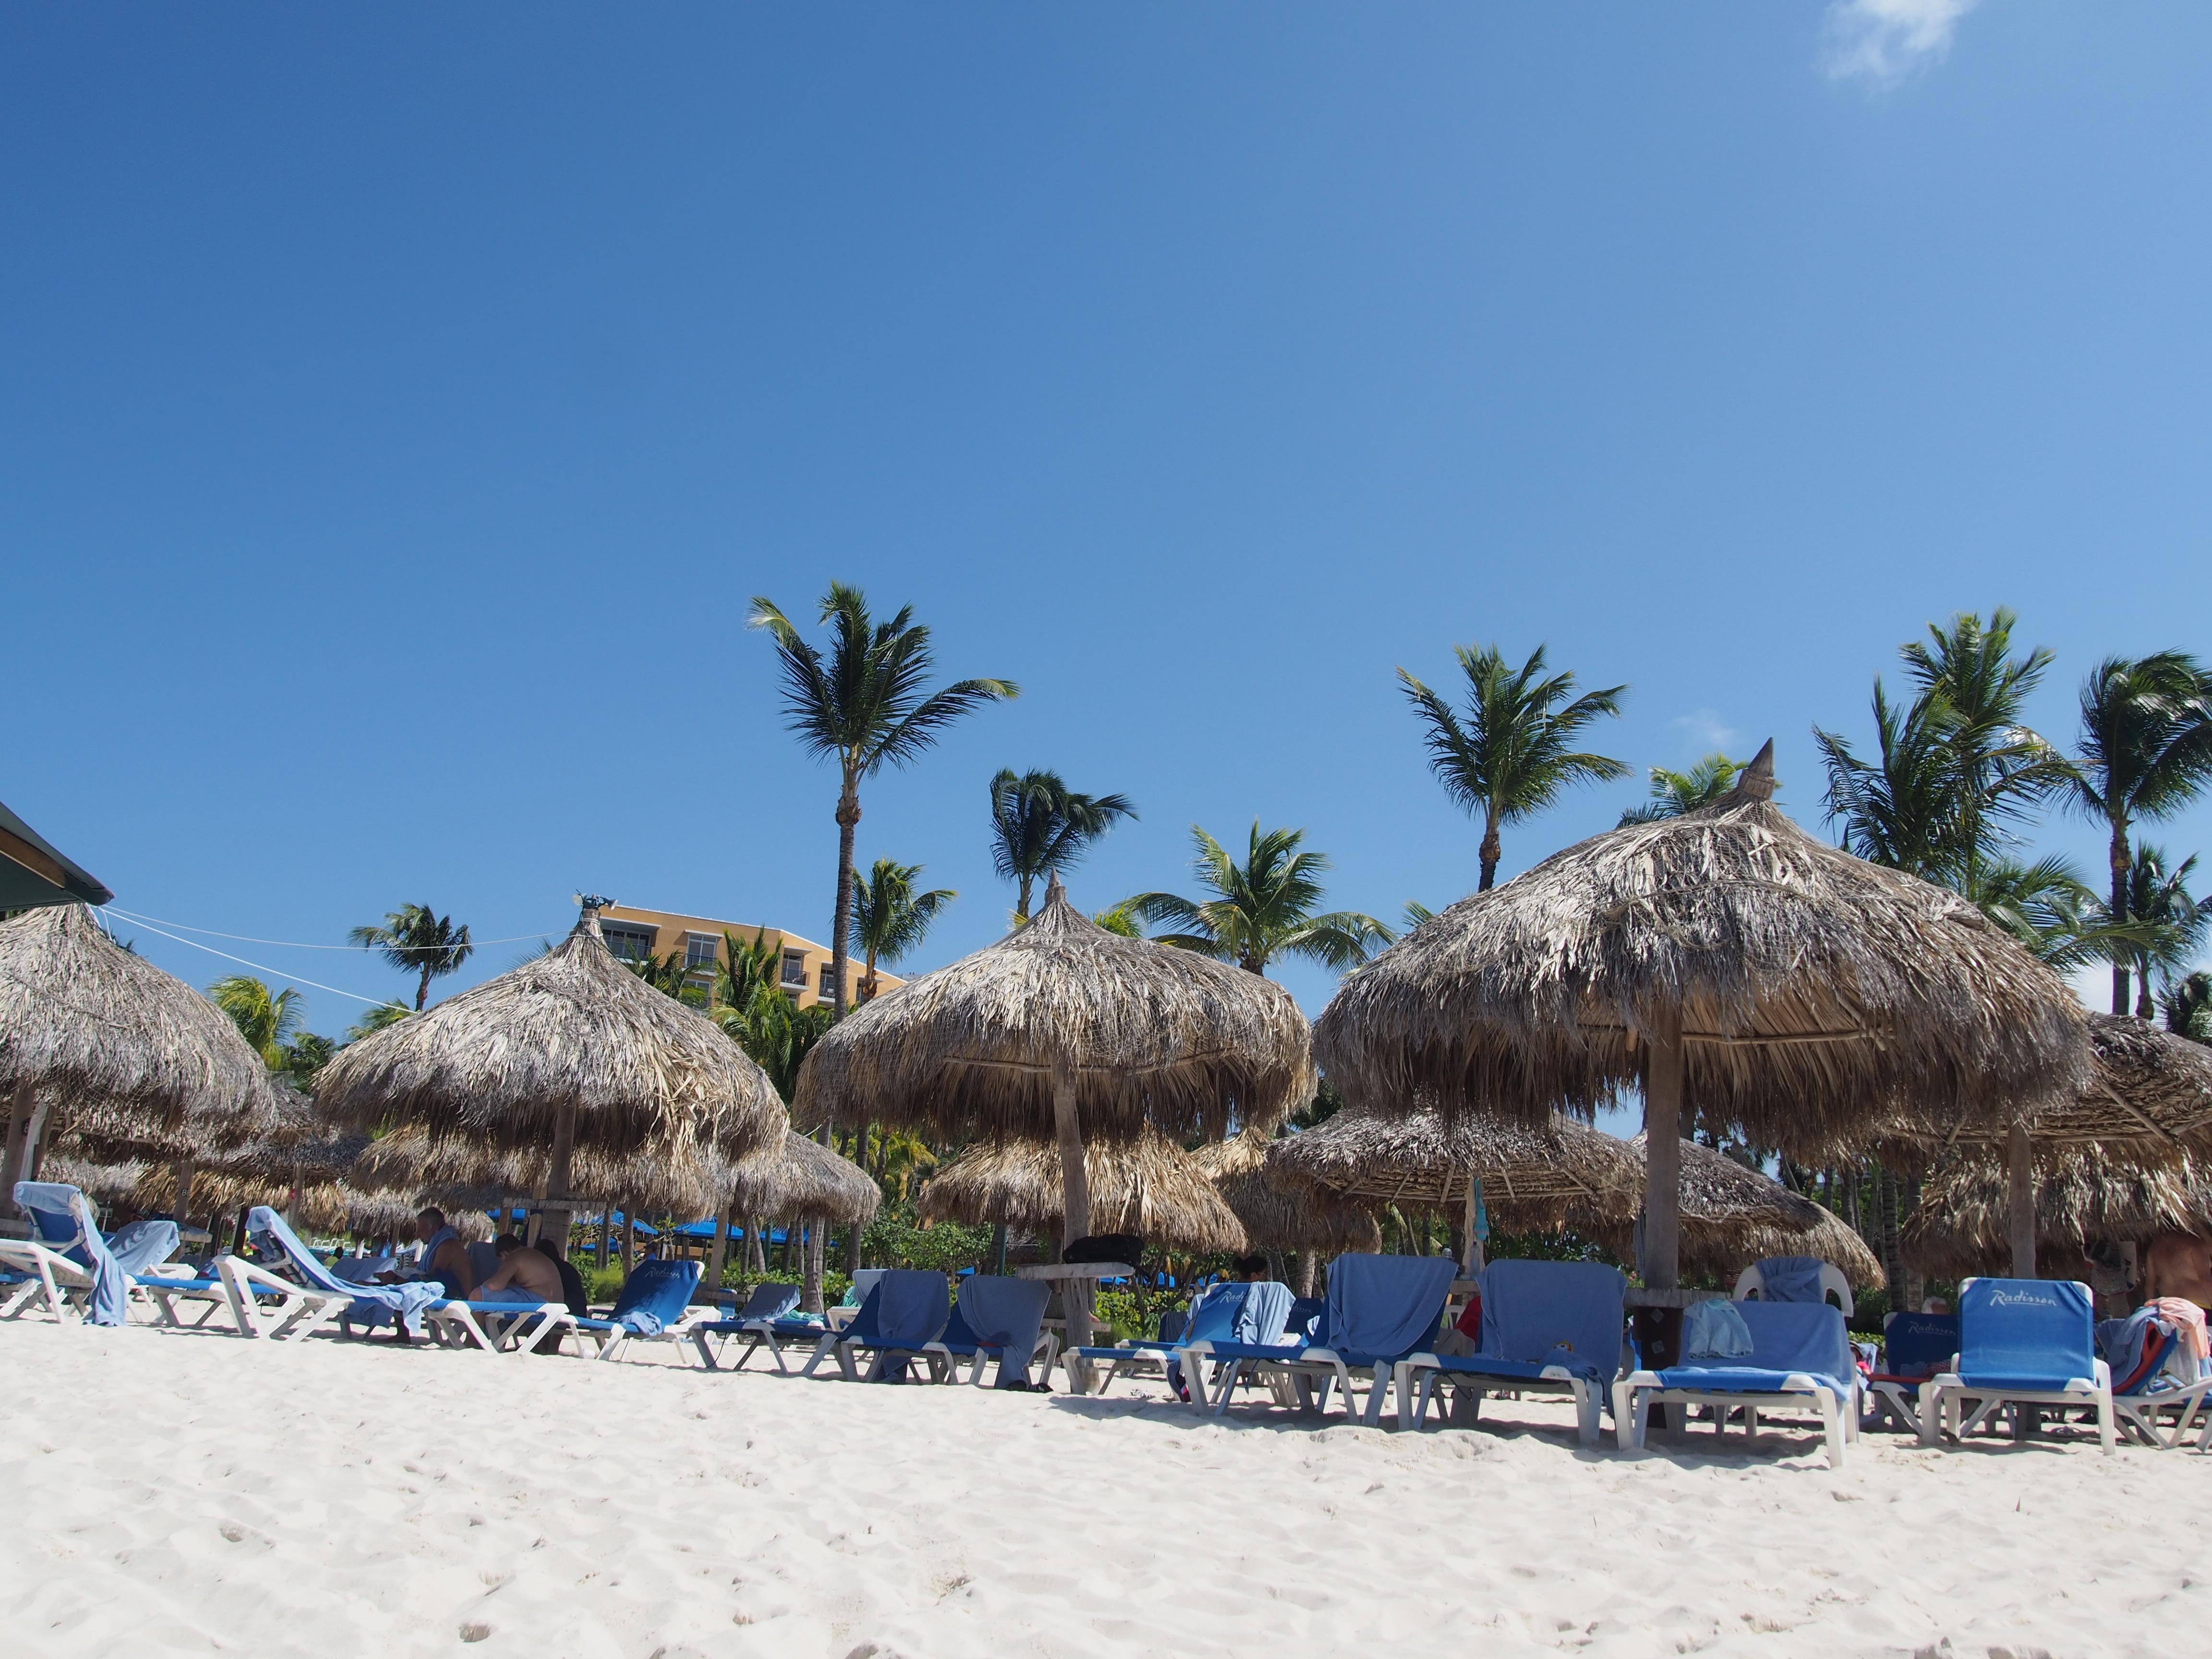 Aruba holiday 2014 Radison hotel beach